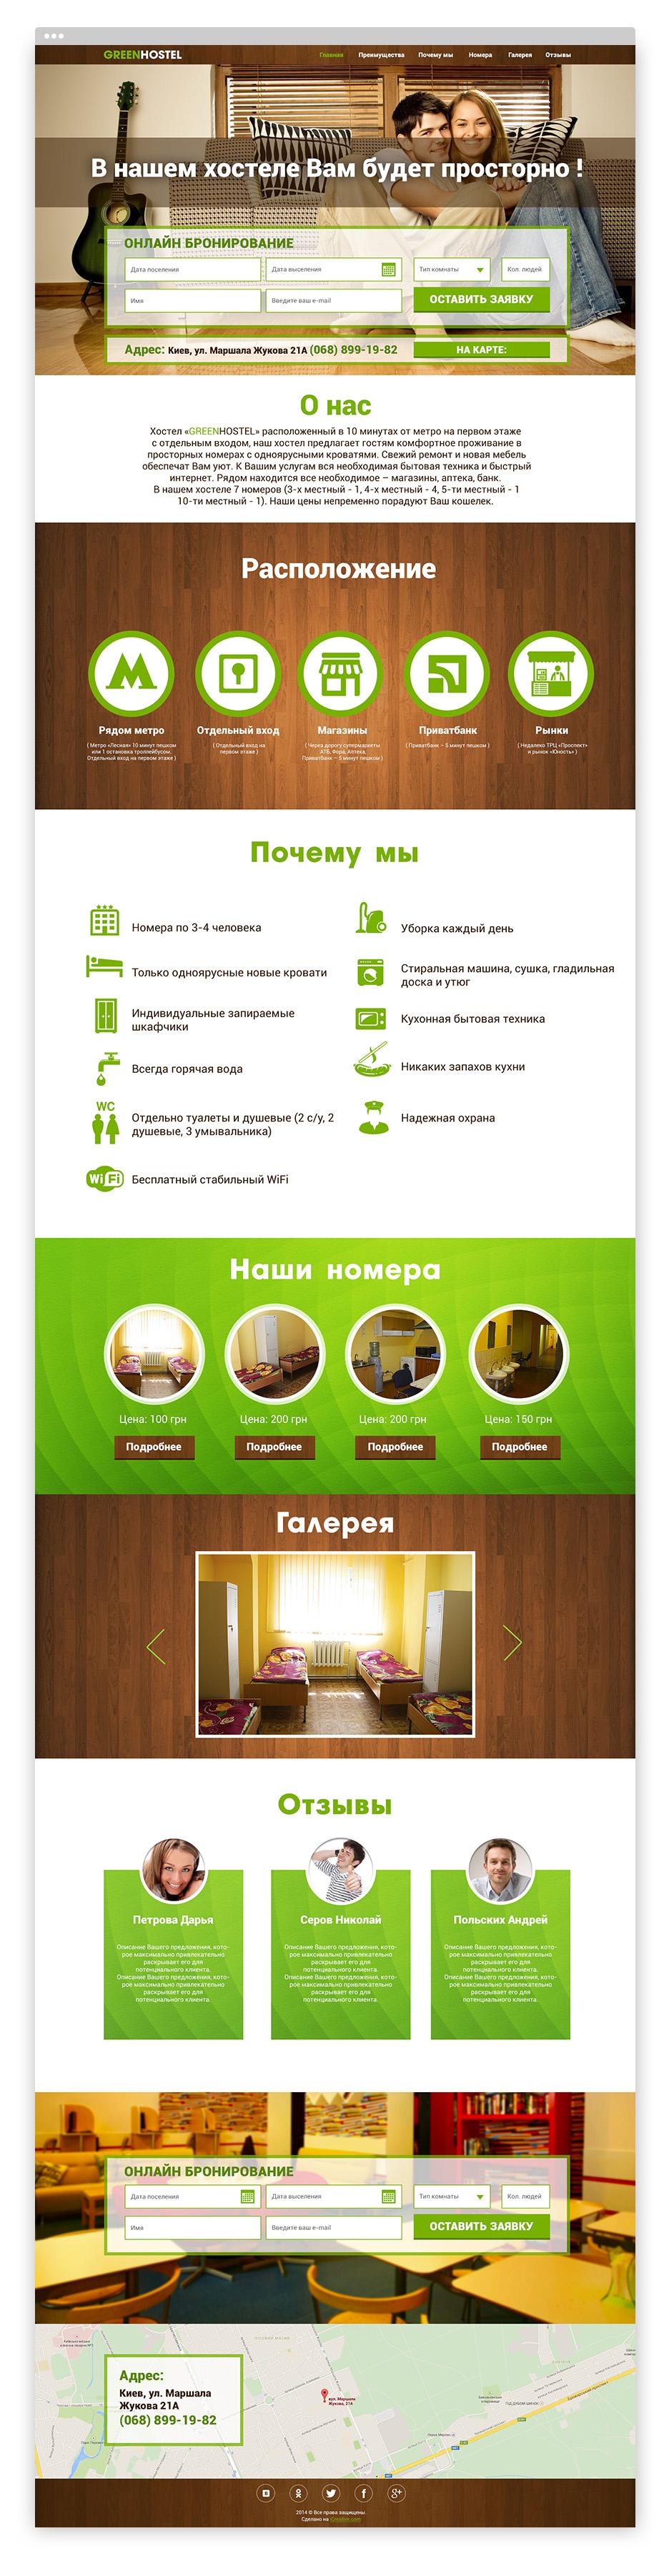 icreative-com-ua_hostel